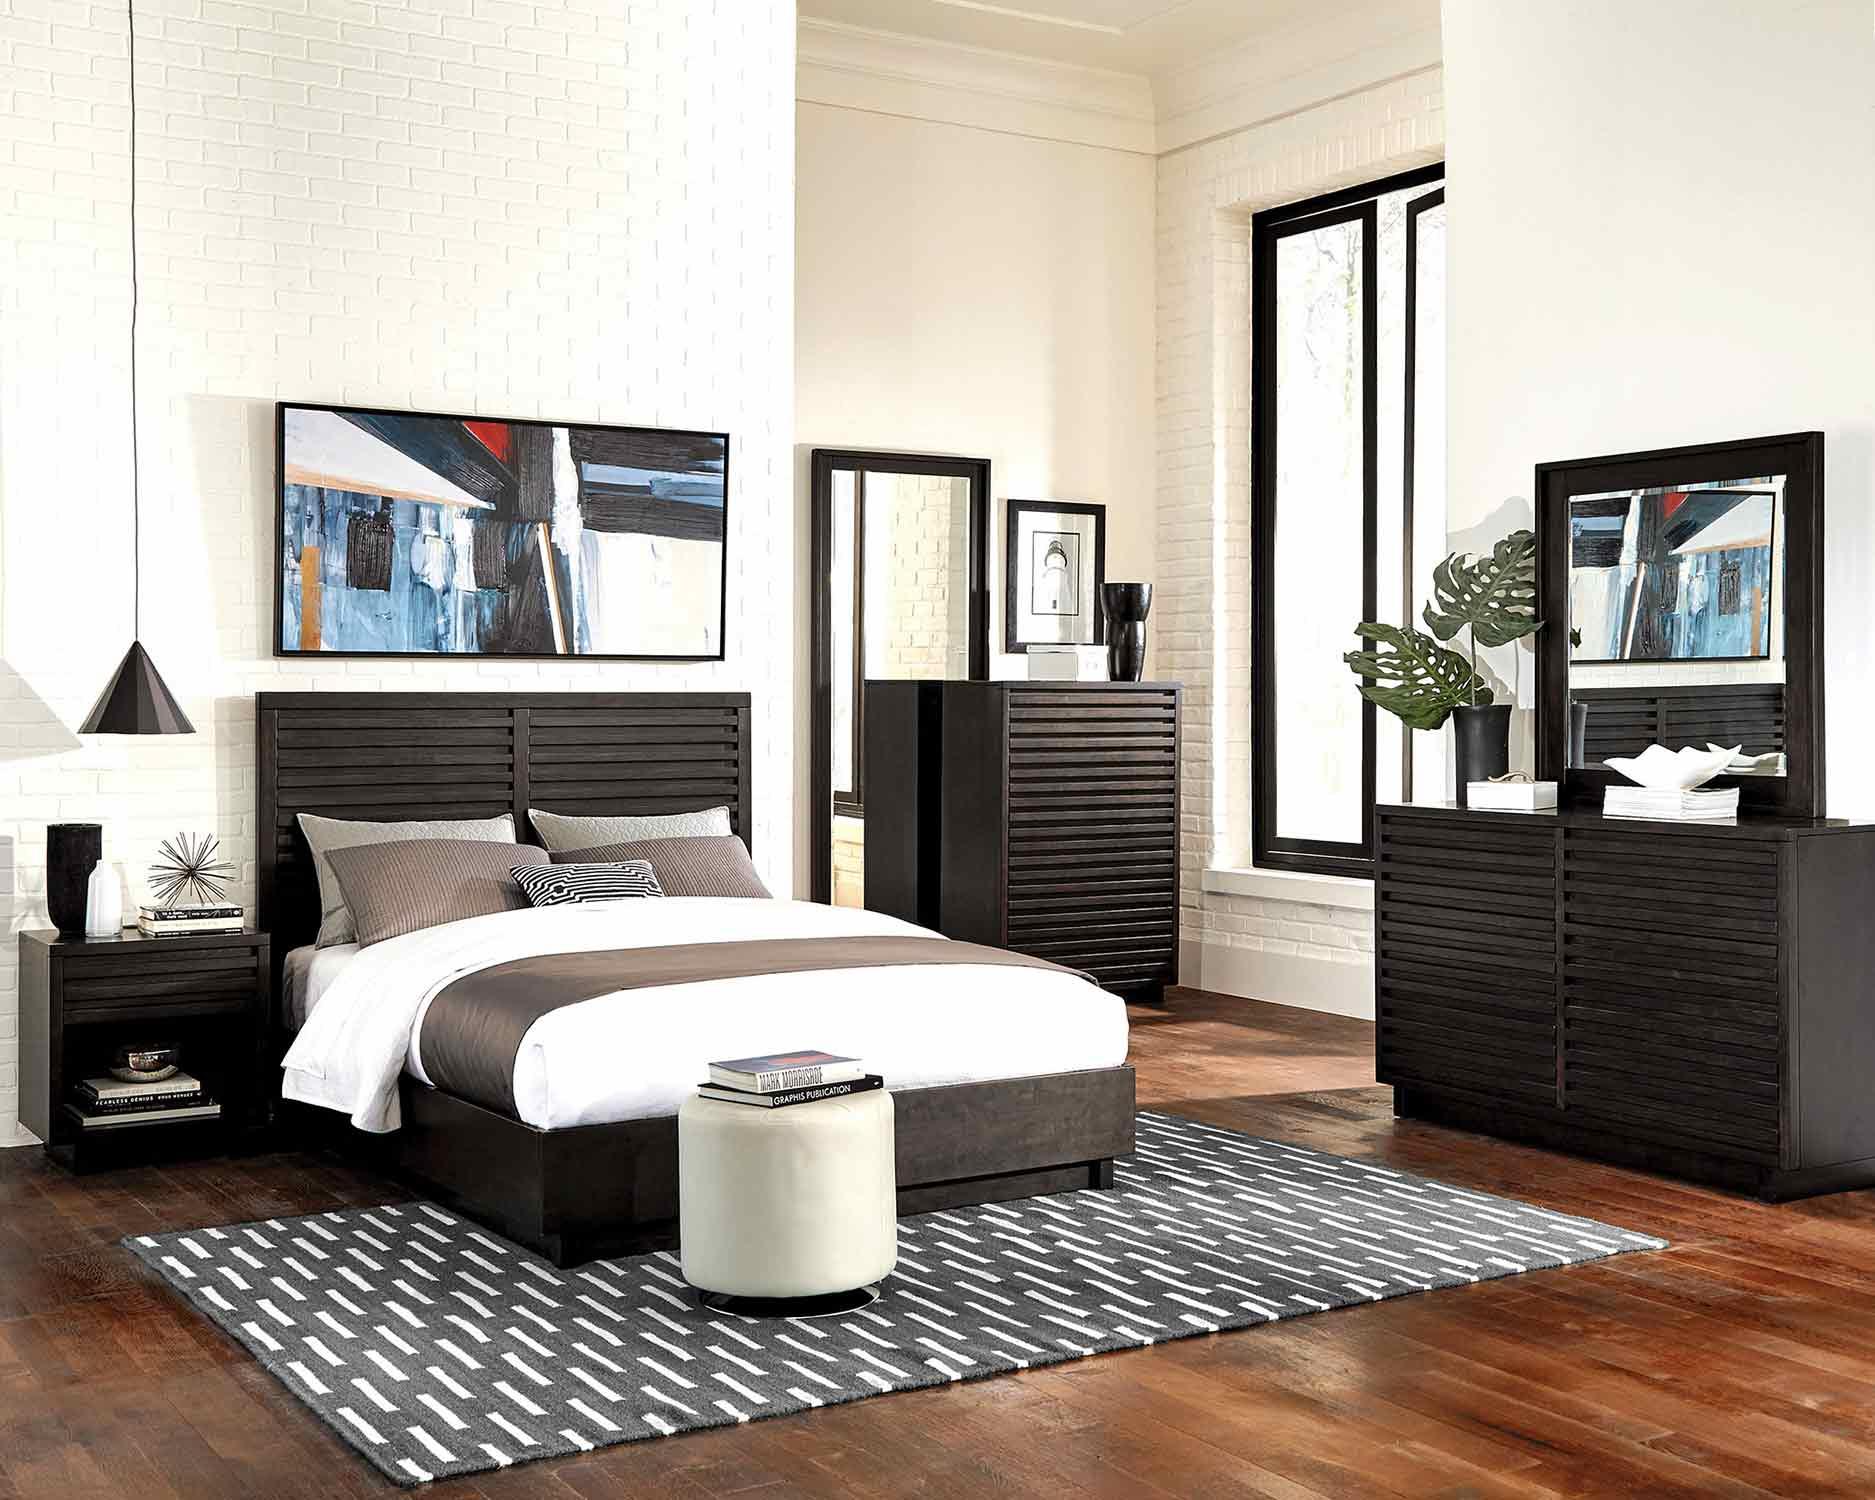 Coaster Matheson Bedroom Set - Graphite